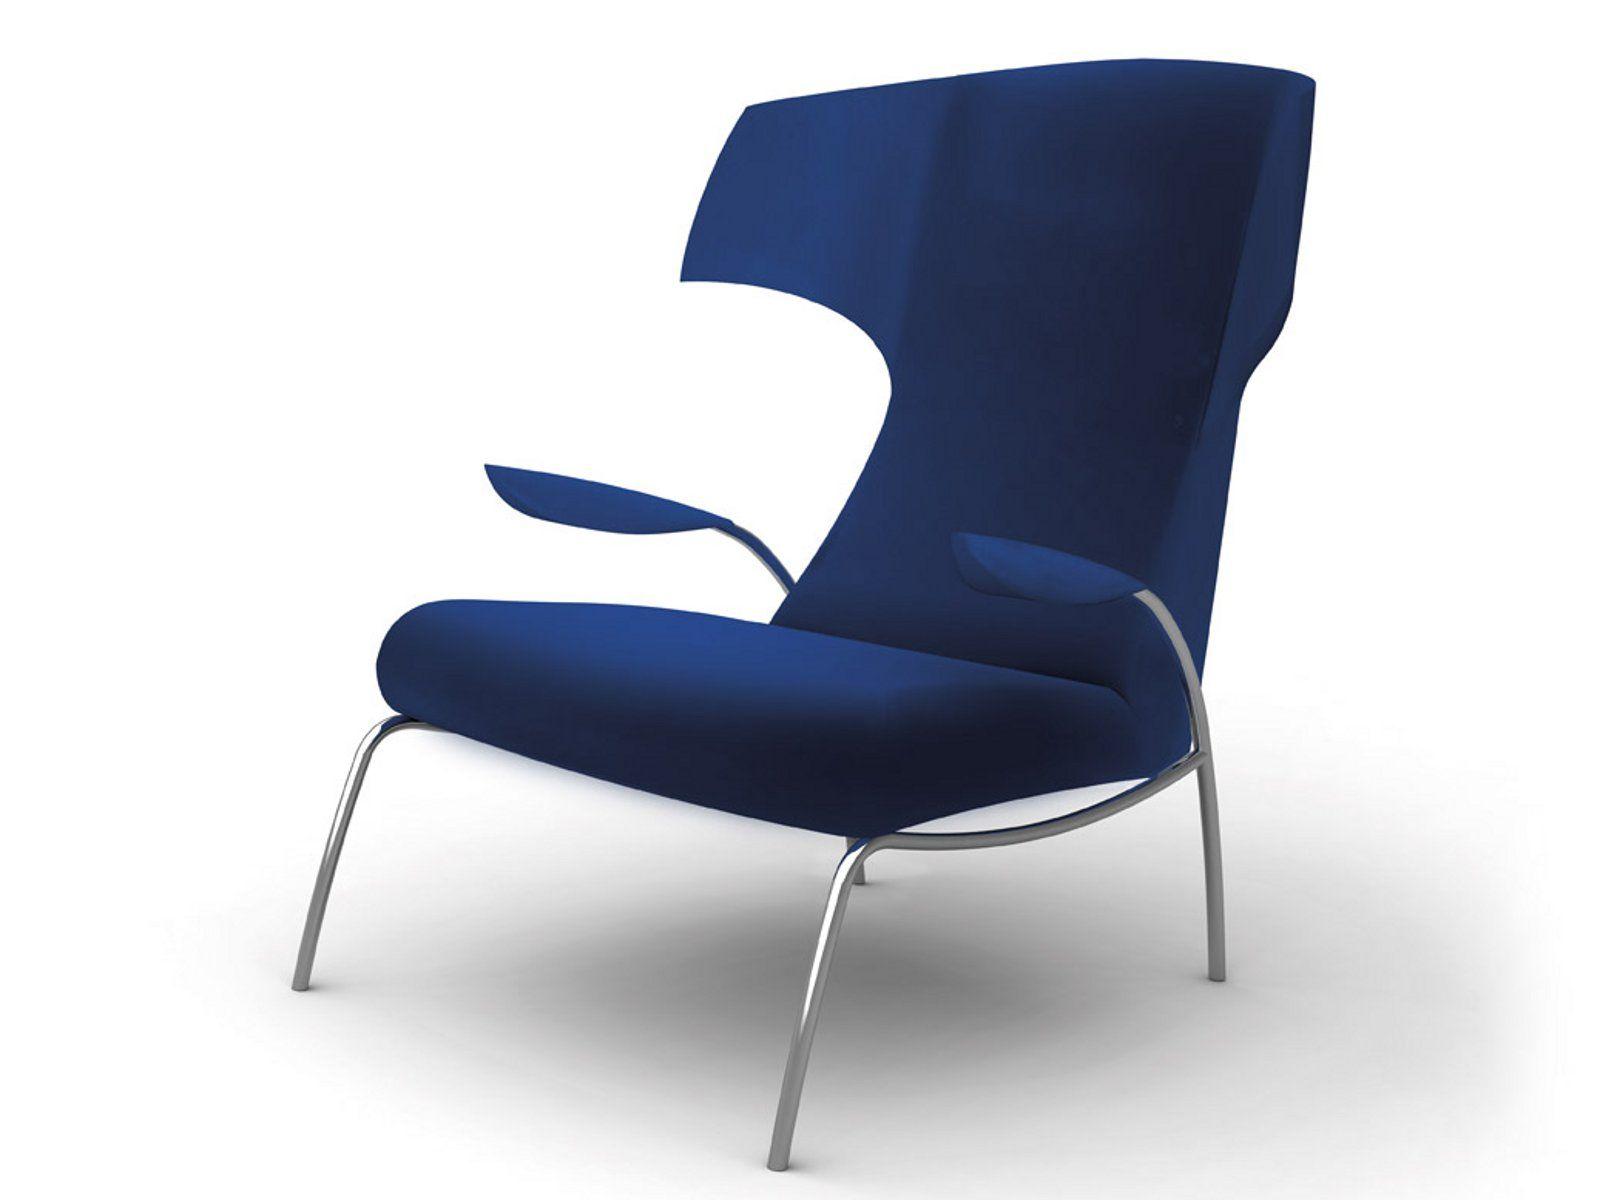 fauteuil oreilles avec repose pieds tify by d sir e design jai jalan. Black Bedroom Furniture Sets. Home Design Ideas